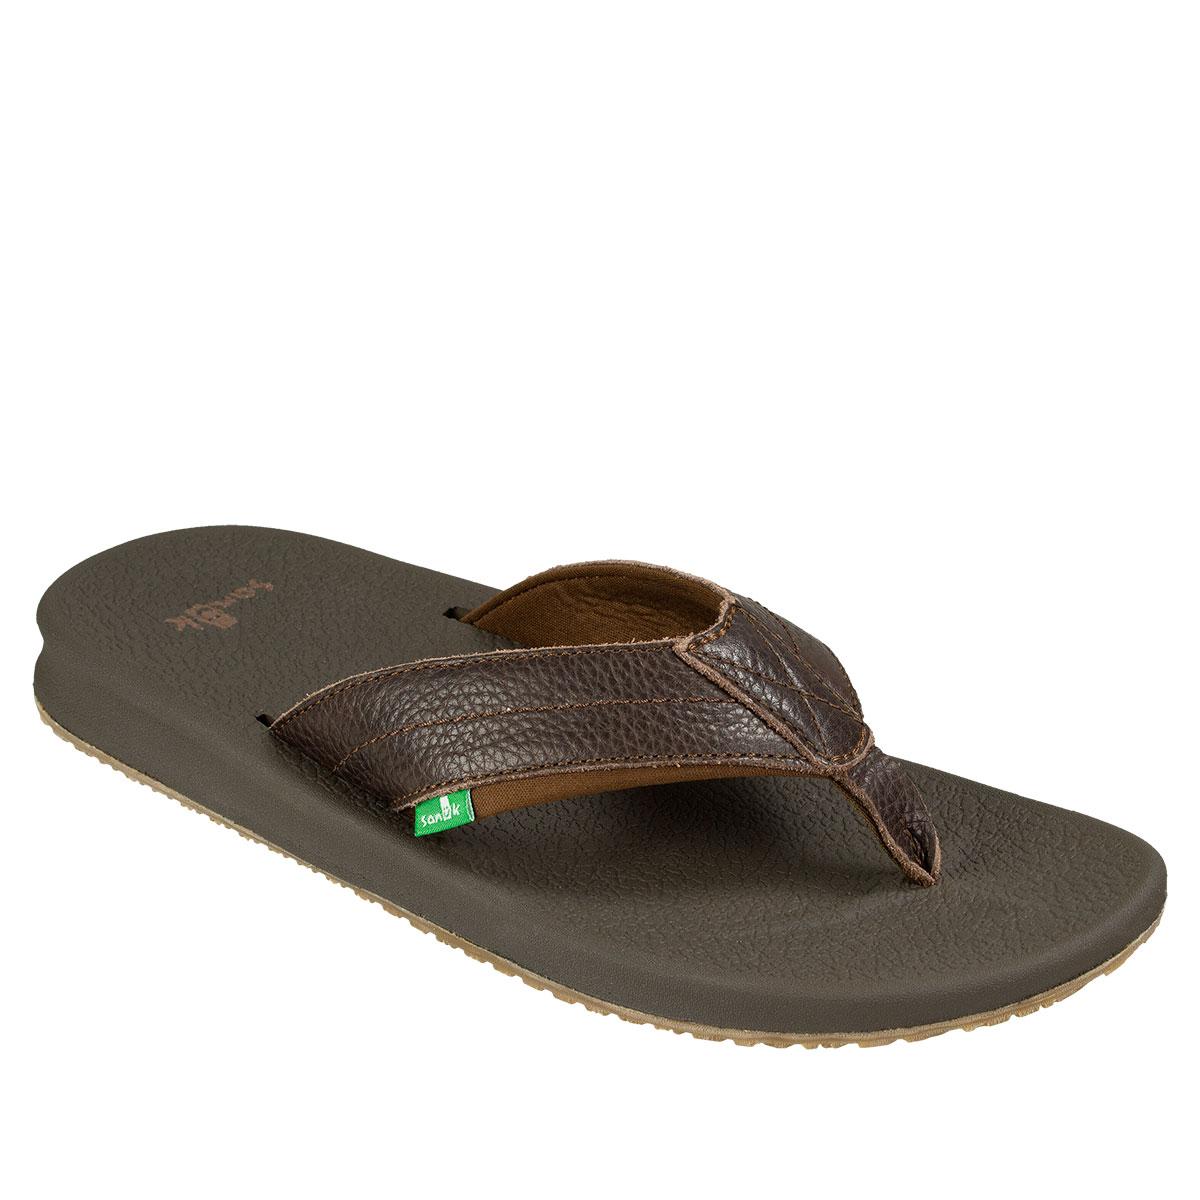 f6214b33737 Sanuk Brumeister Primo Men s Flip Flops Dark Brown 9 190108507379